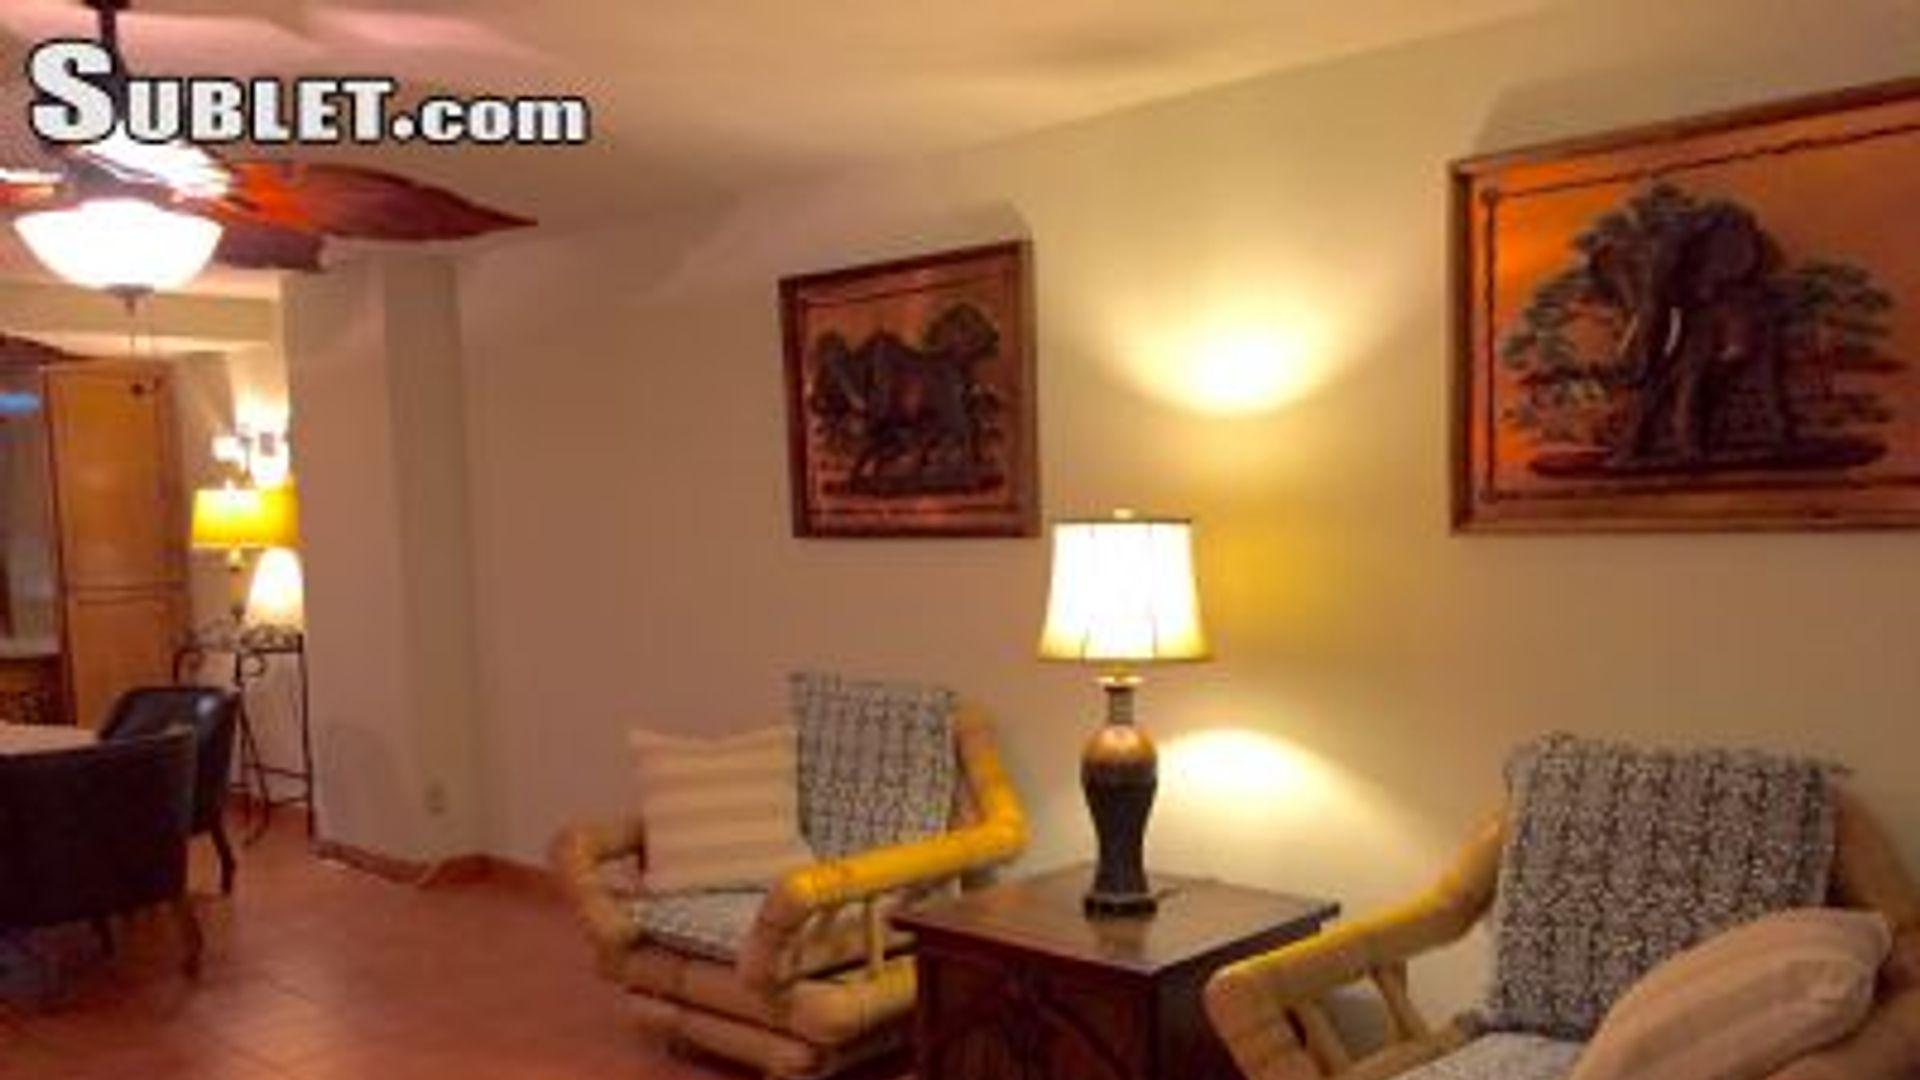 2 bedroom apartment at las quintas boulevard benito